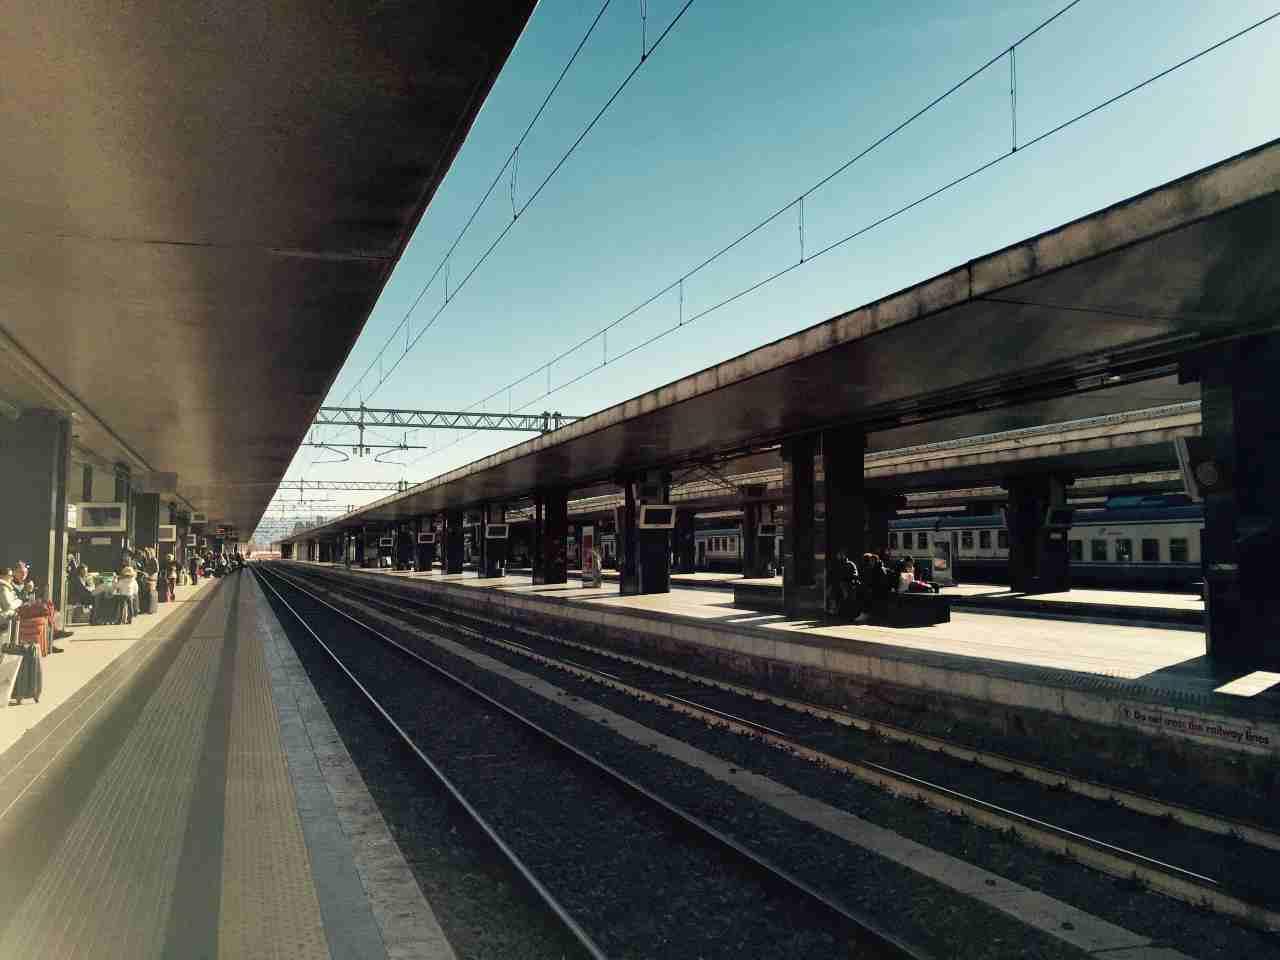 Termini, la stazione più grande d'Italia - MeteoWeek.com